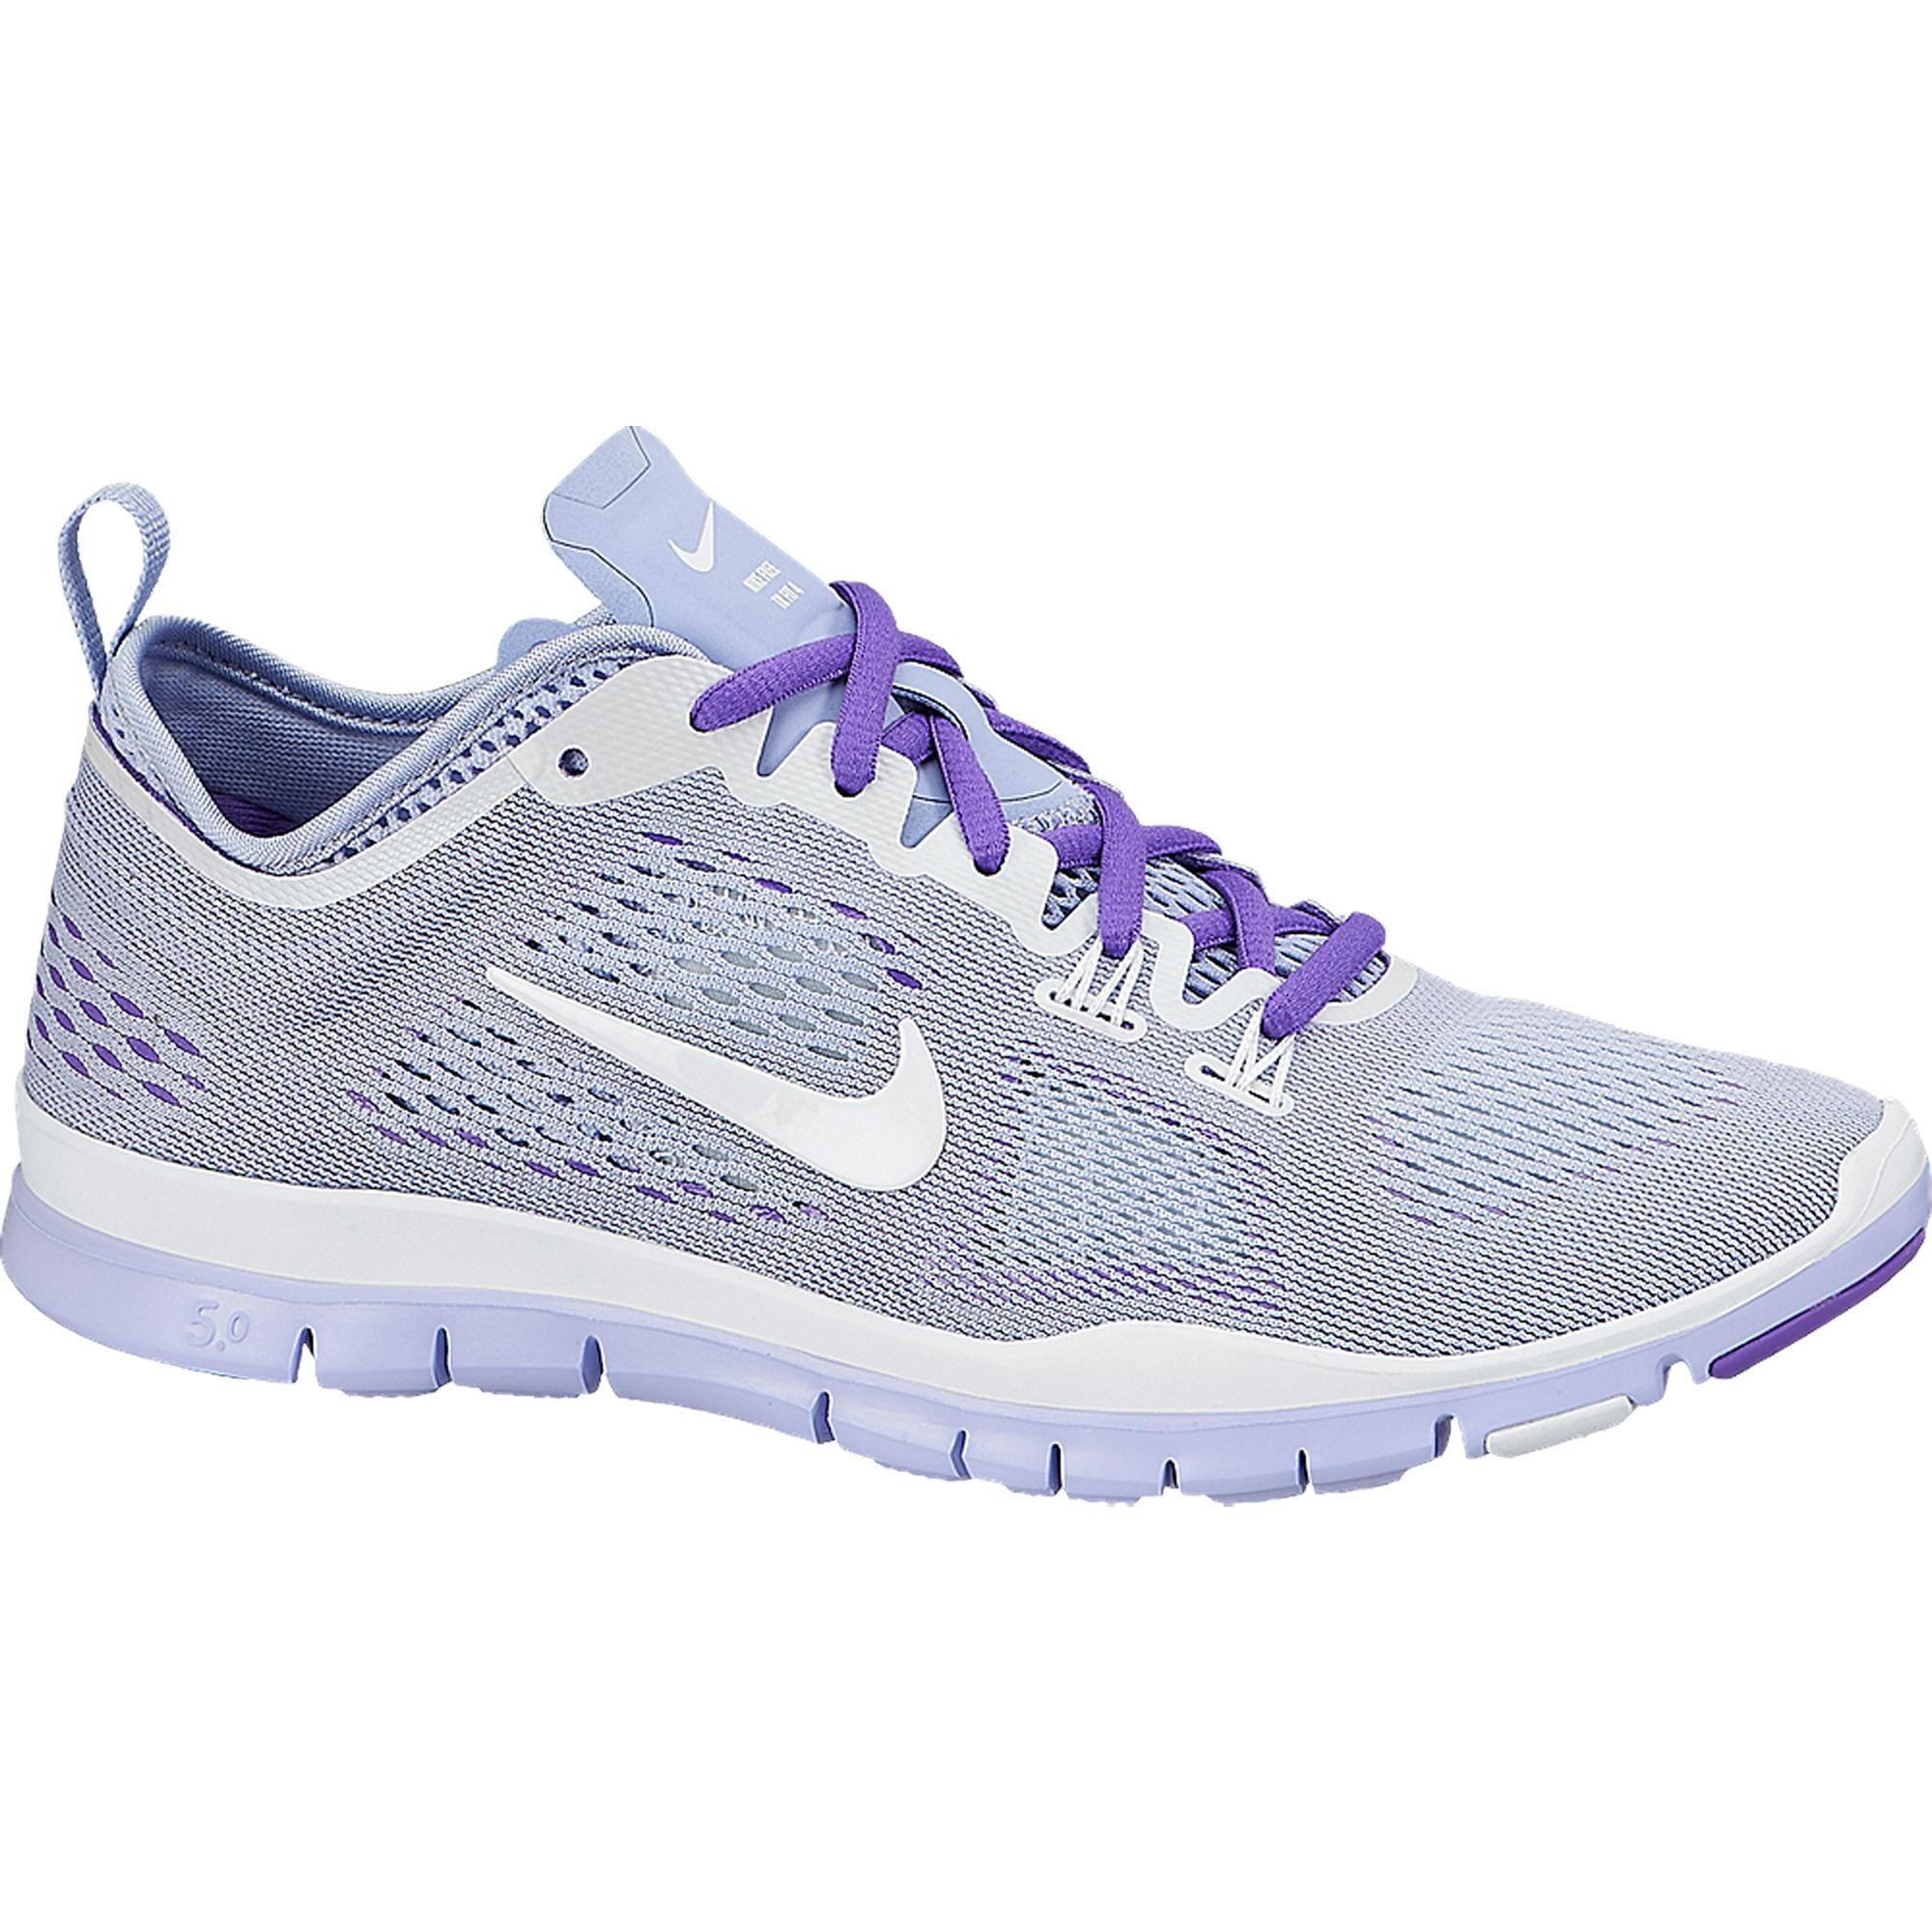 nike free 5.0 tr fit breathe womens training shoes - su14